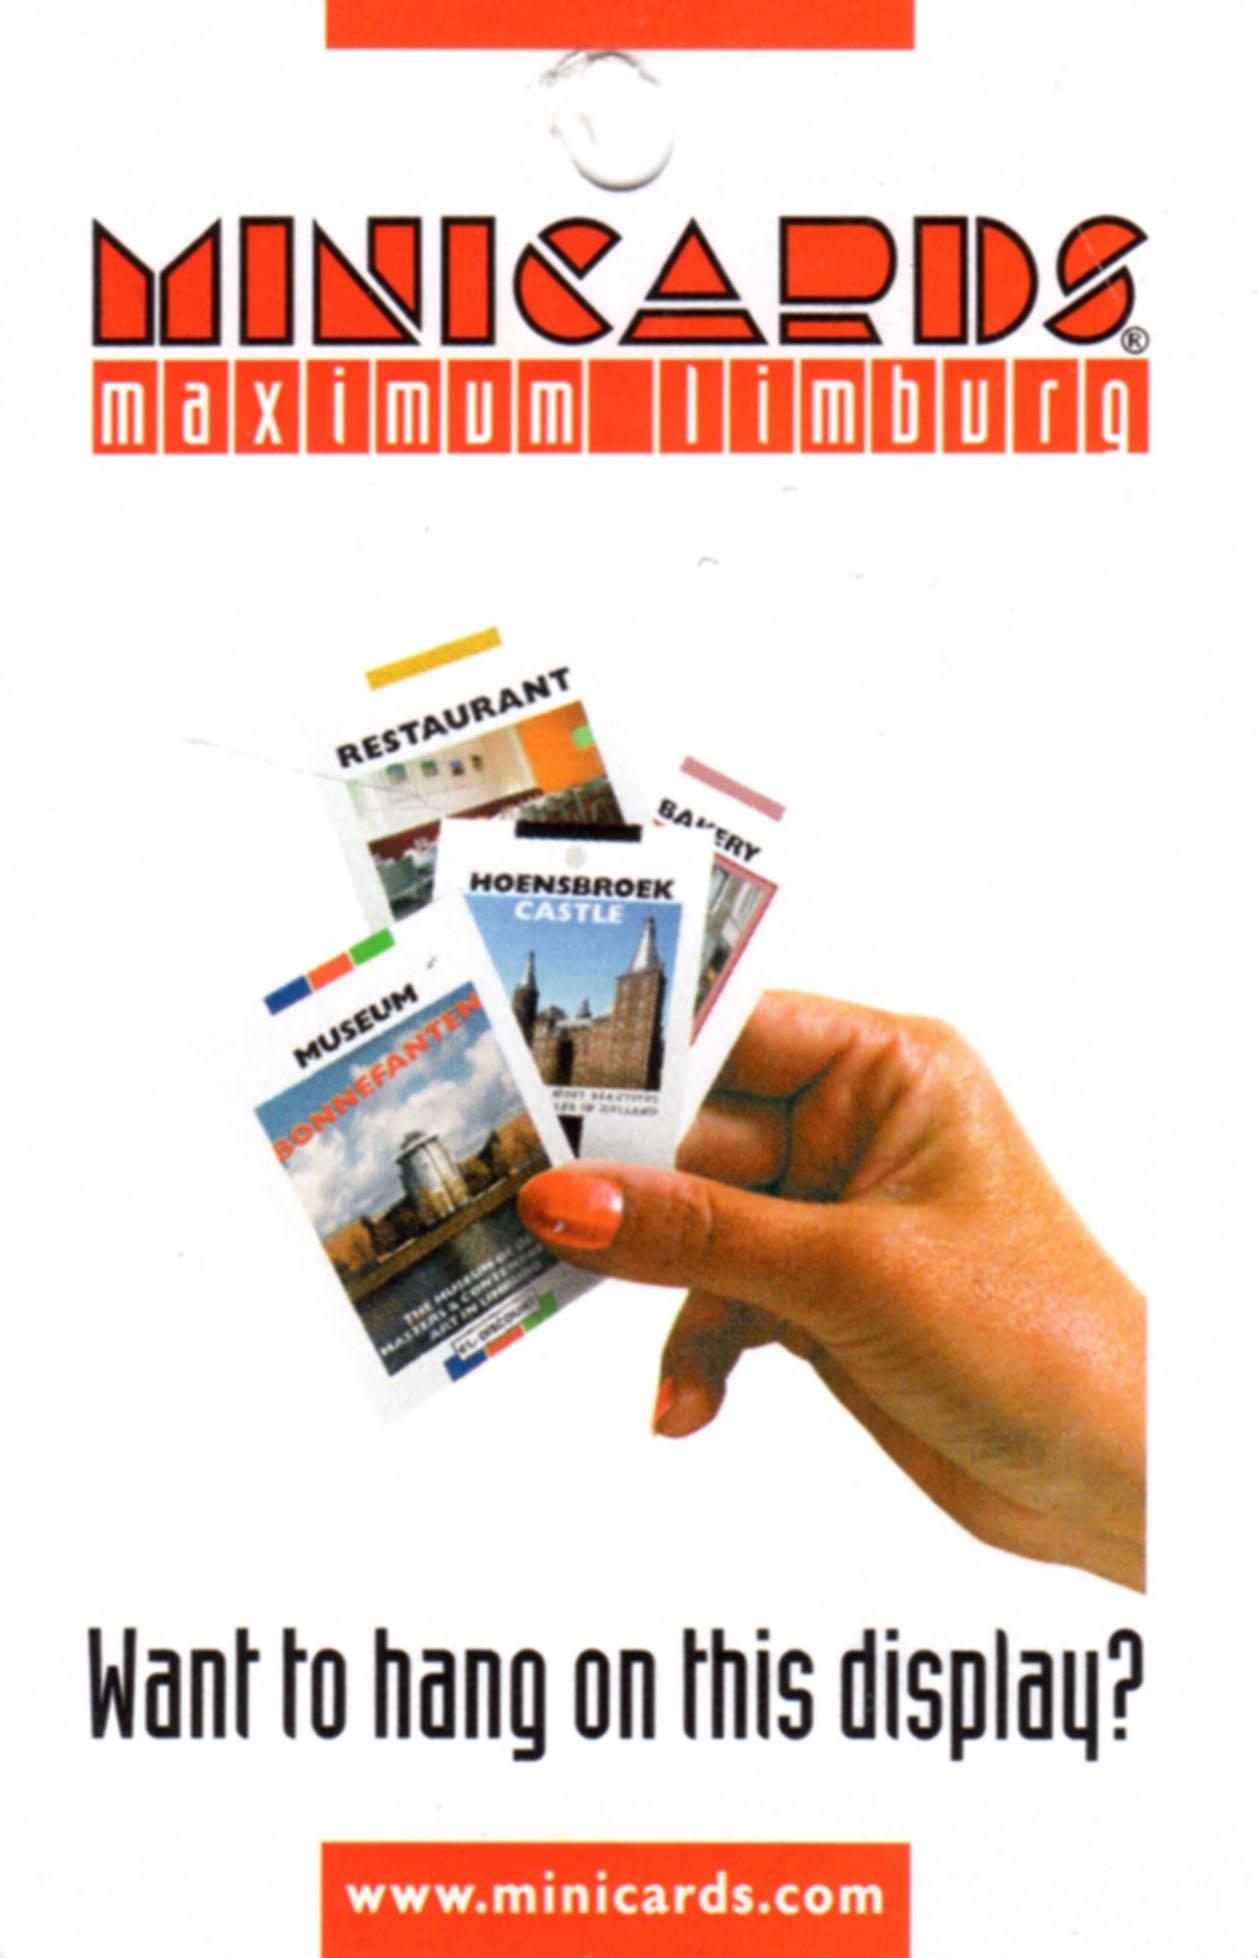 Mini cards info